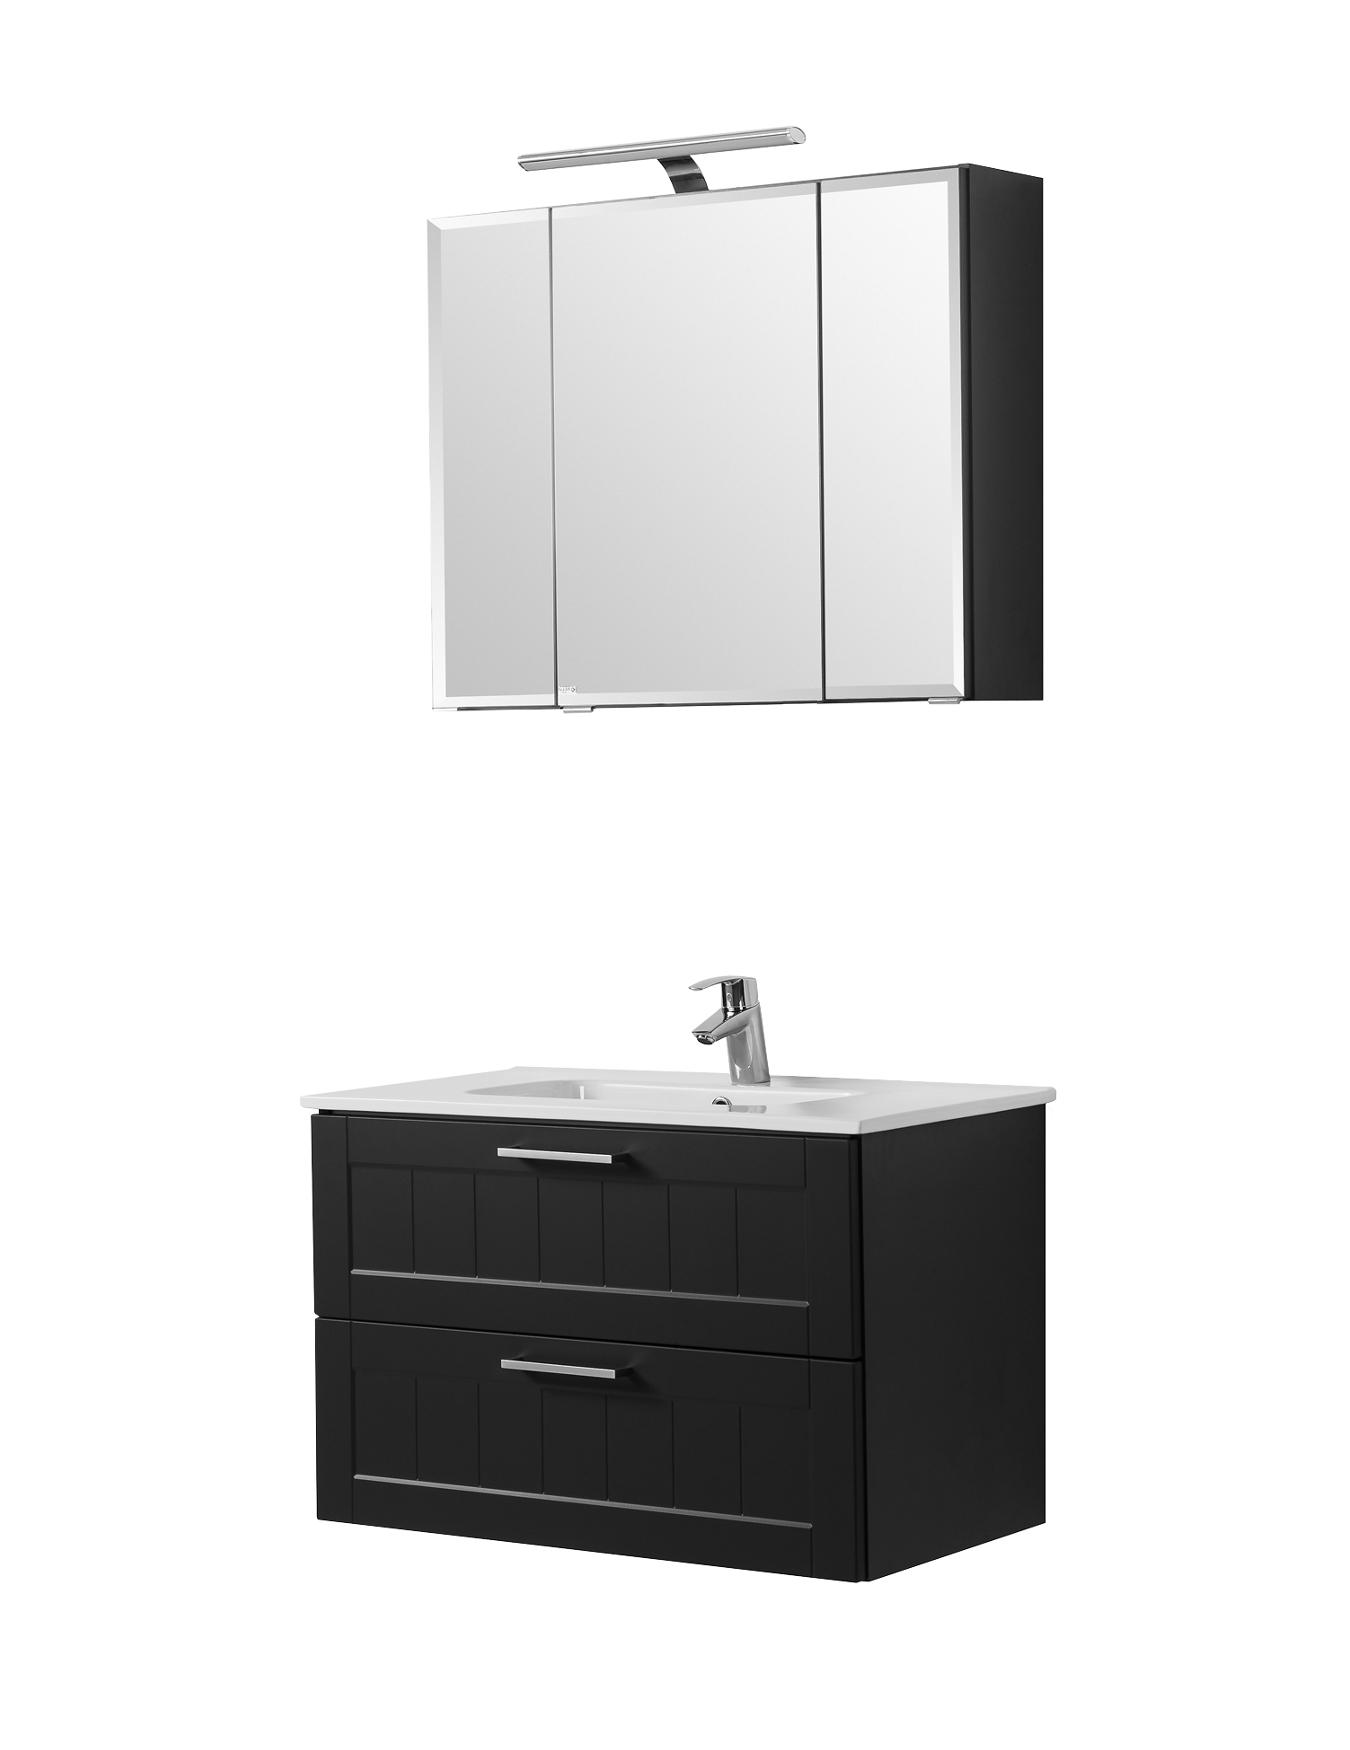 badm bel set barolo mit waschtisch 4 teilig 80 cm breit grau matt bad badm belsets. Black Bedroom Furniture Sets. Home Design Ideas